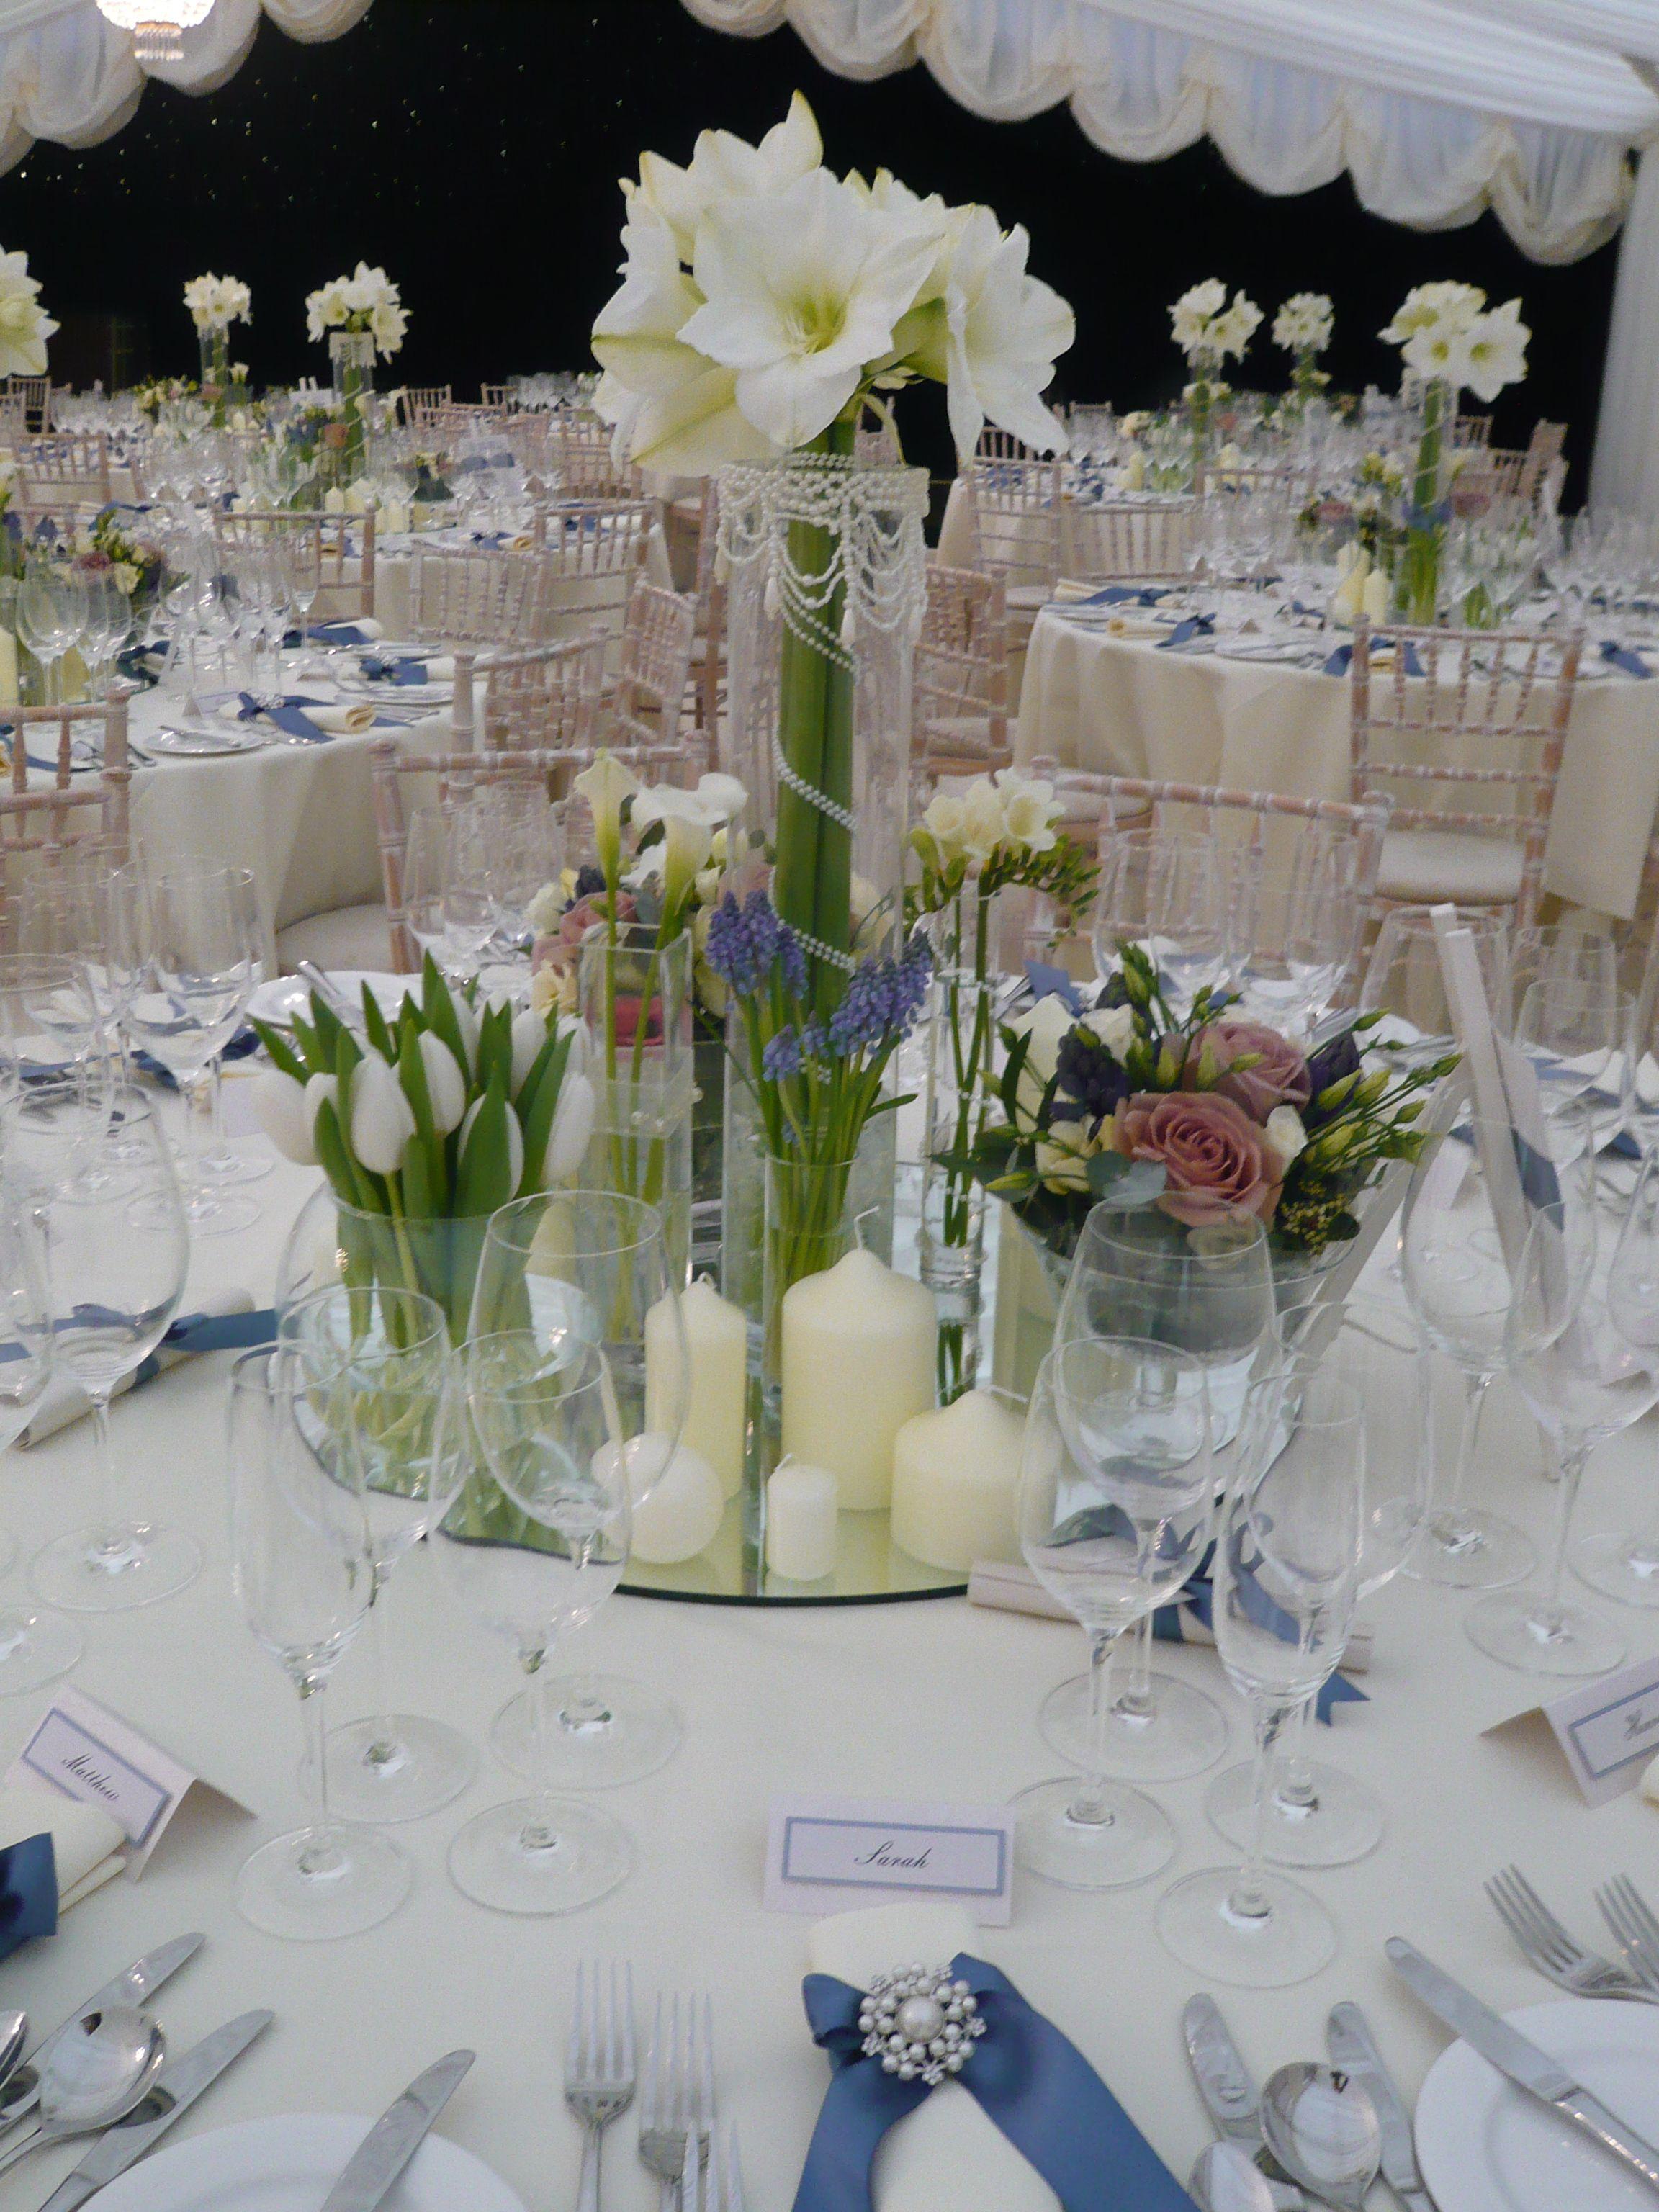 Beautiful Wedding Table Setting By Www Tophatmarquees Co Uk Wedding Table Settings Wedding Table Marquee Wedding